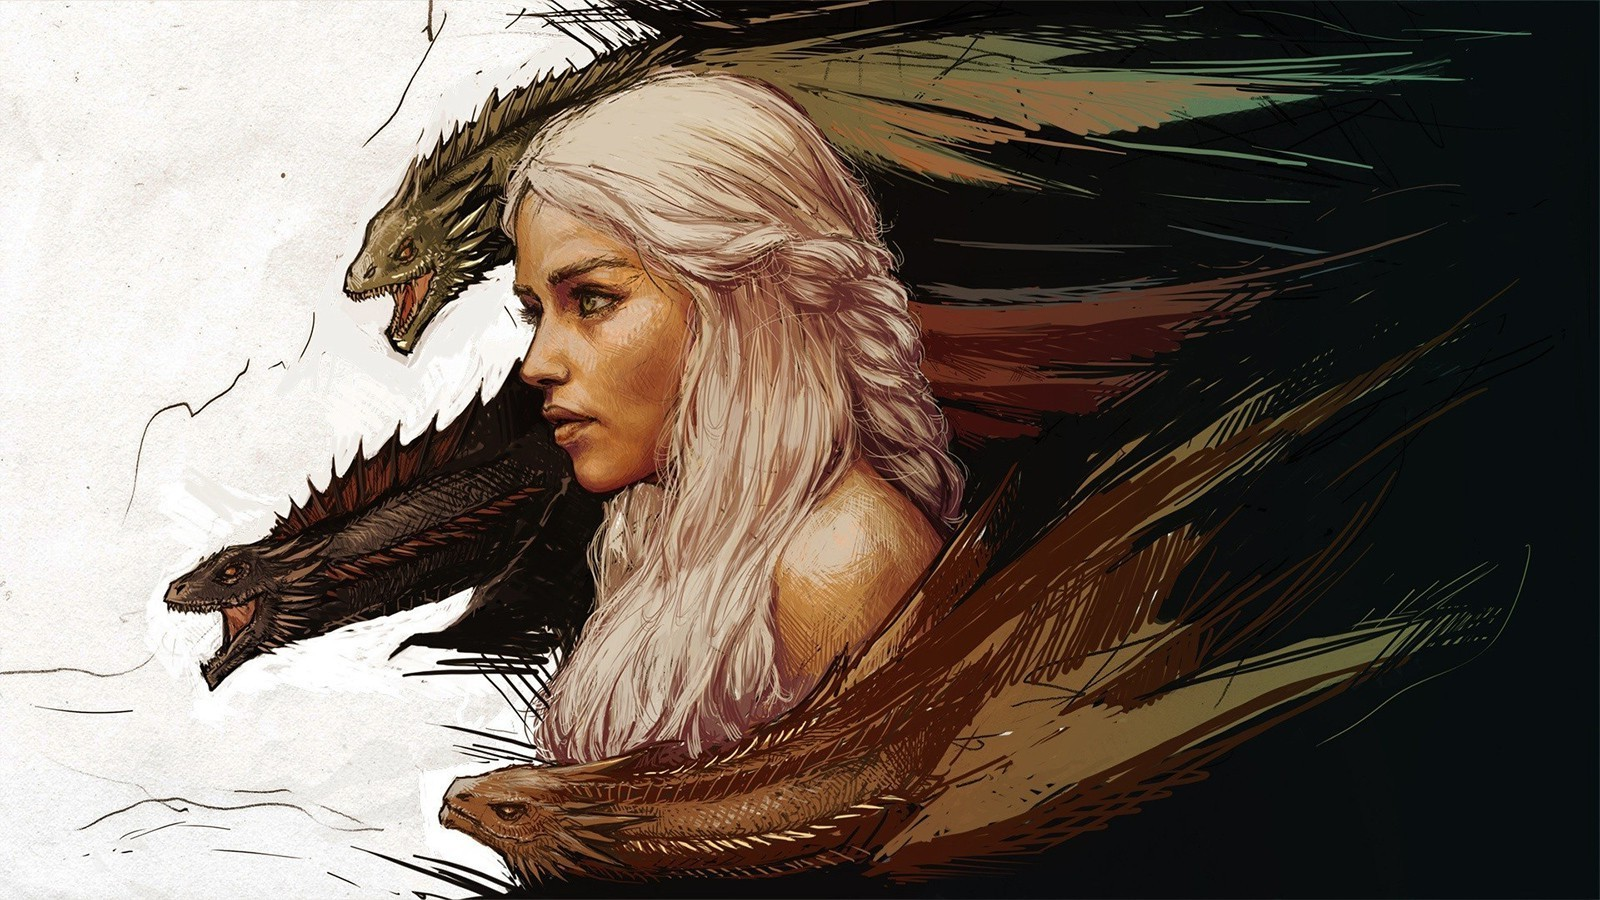 Game Of Thrones Daenerys Targaryen Emilia Clarke Game Of